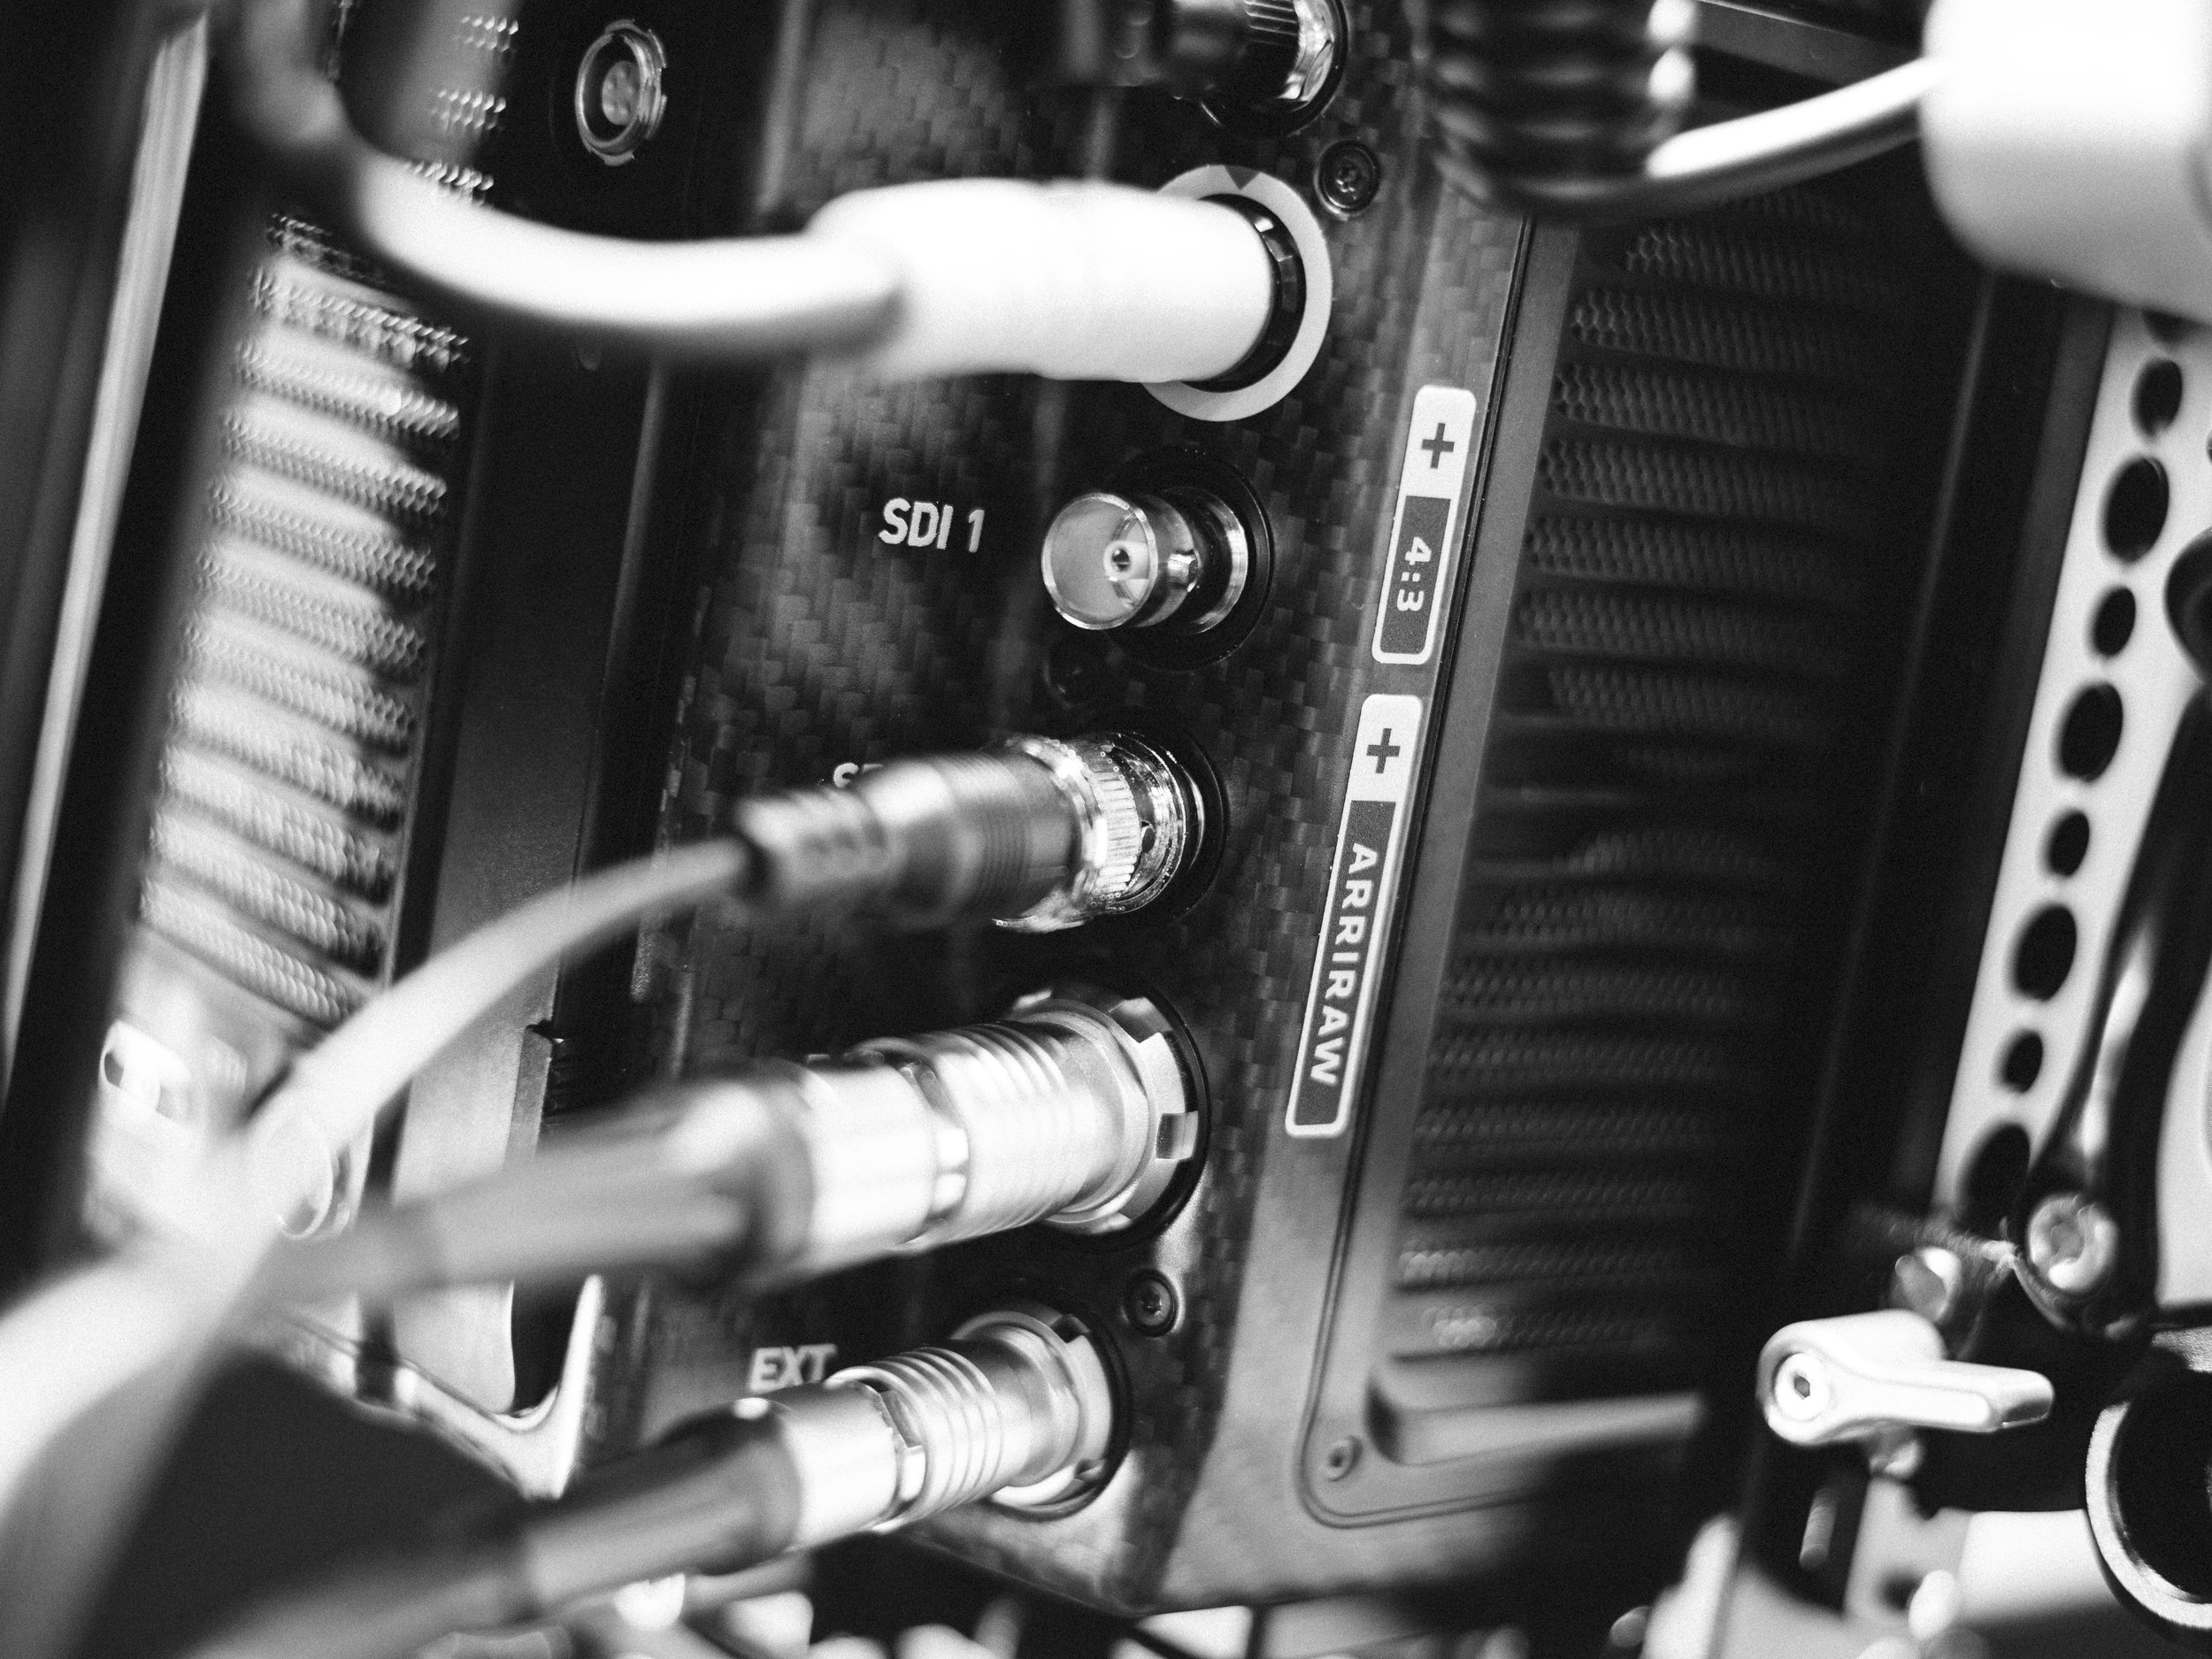 M2403673.jpg